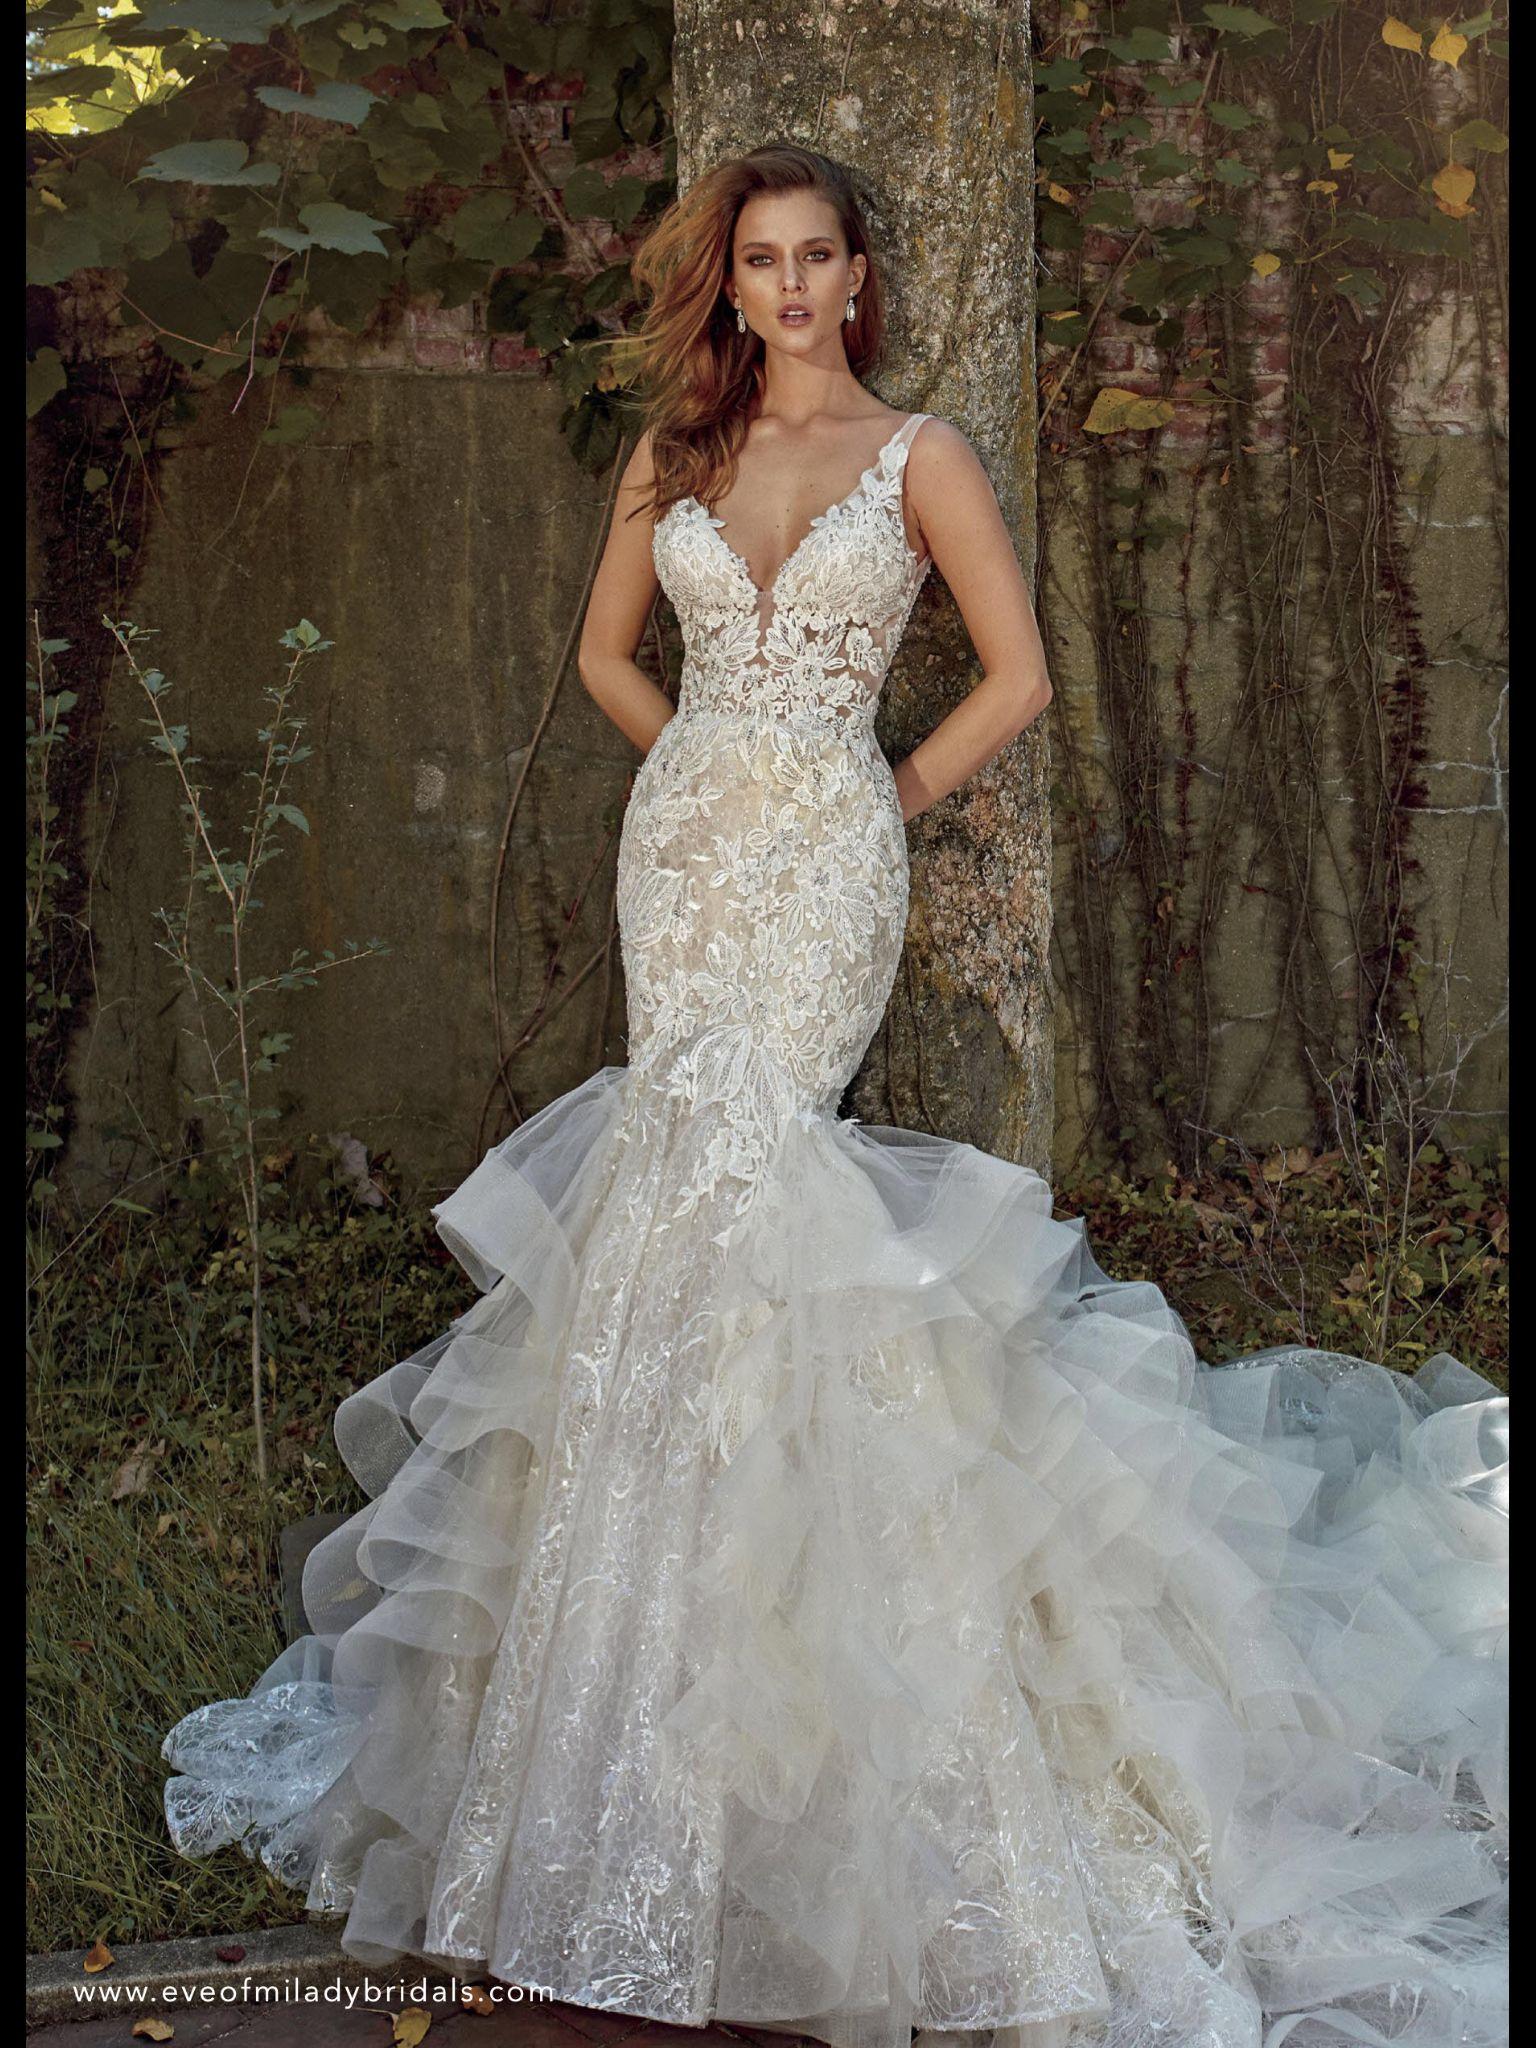 Lace wedding dress under 200 november 2018 Contents